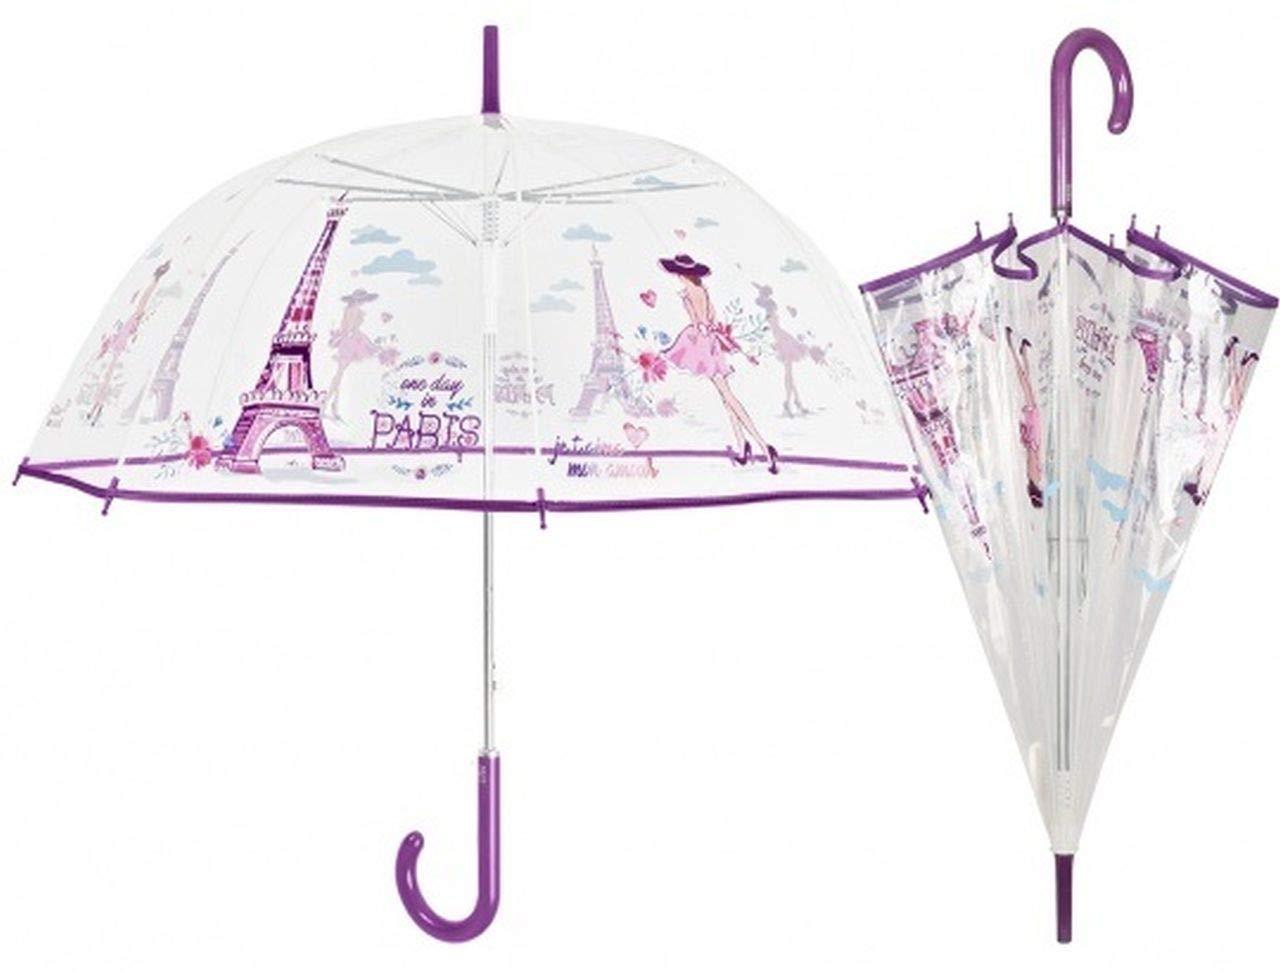 Ten Ombrello Donna Cupola Automatico Trasparente con Stampa Parigi - cod. HU00430XX - LUN.89 cm - Lar.89 cm - Ø89 cm by Varotto & Co.